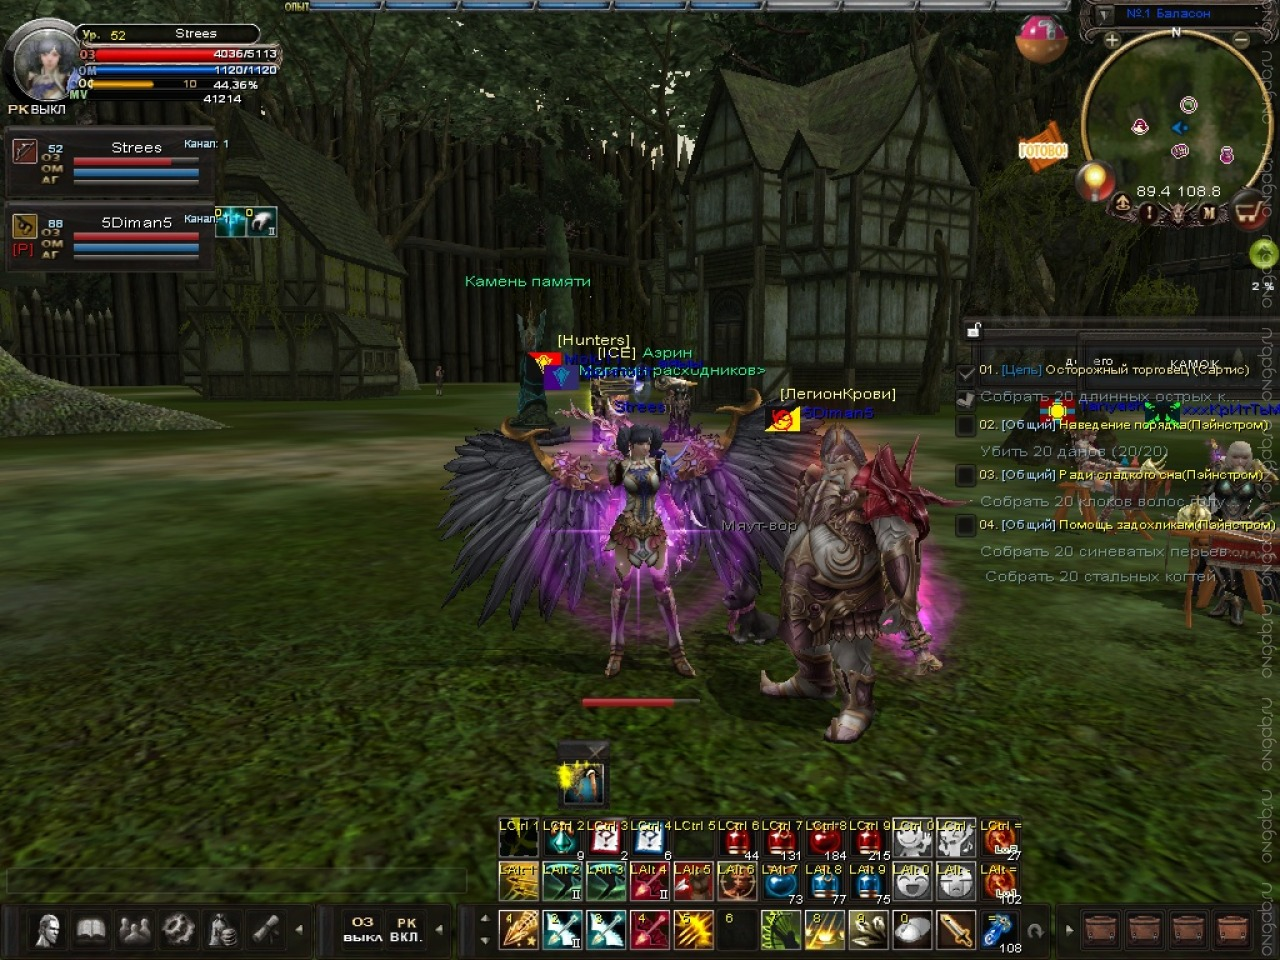 Скриншот Карос: Начало #335459